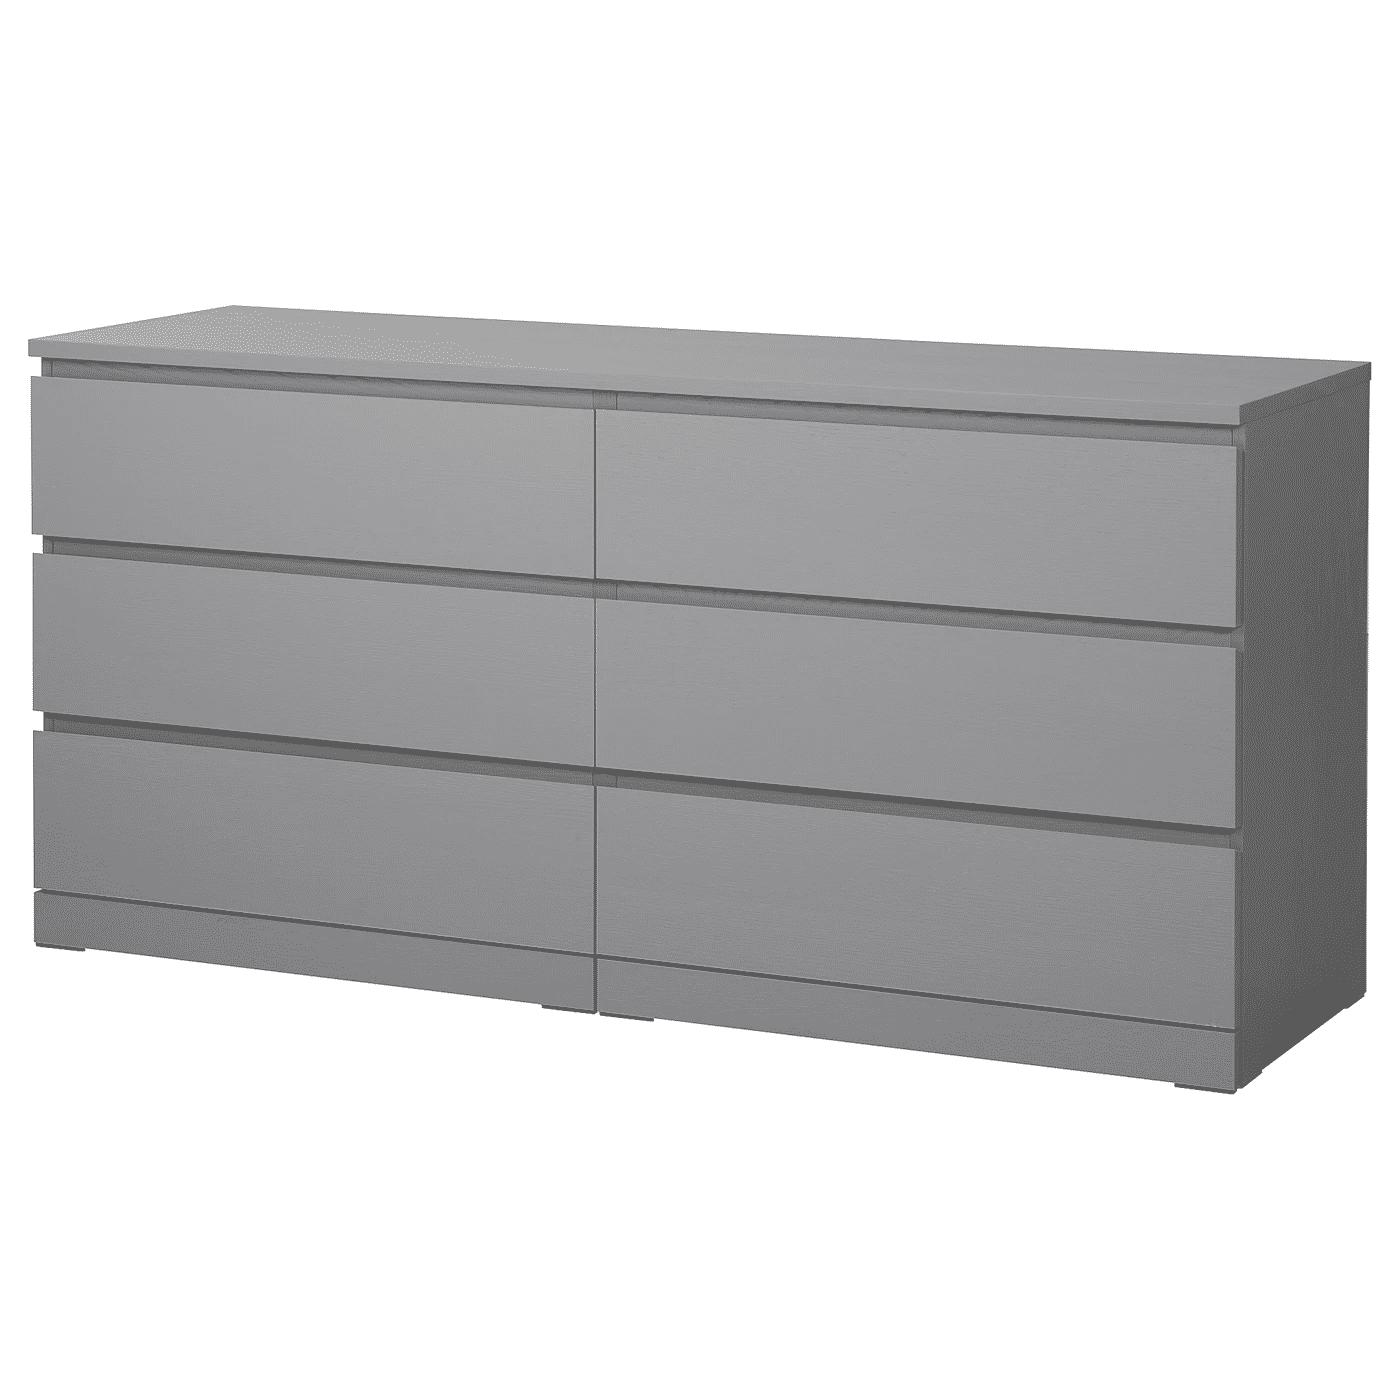 Malm 6- Drawer Dresser